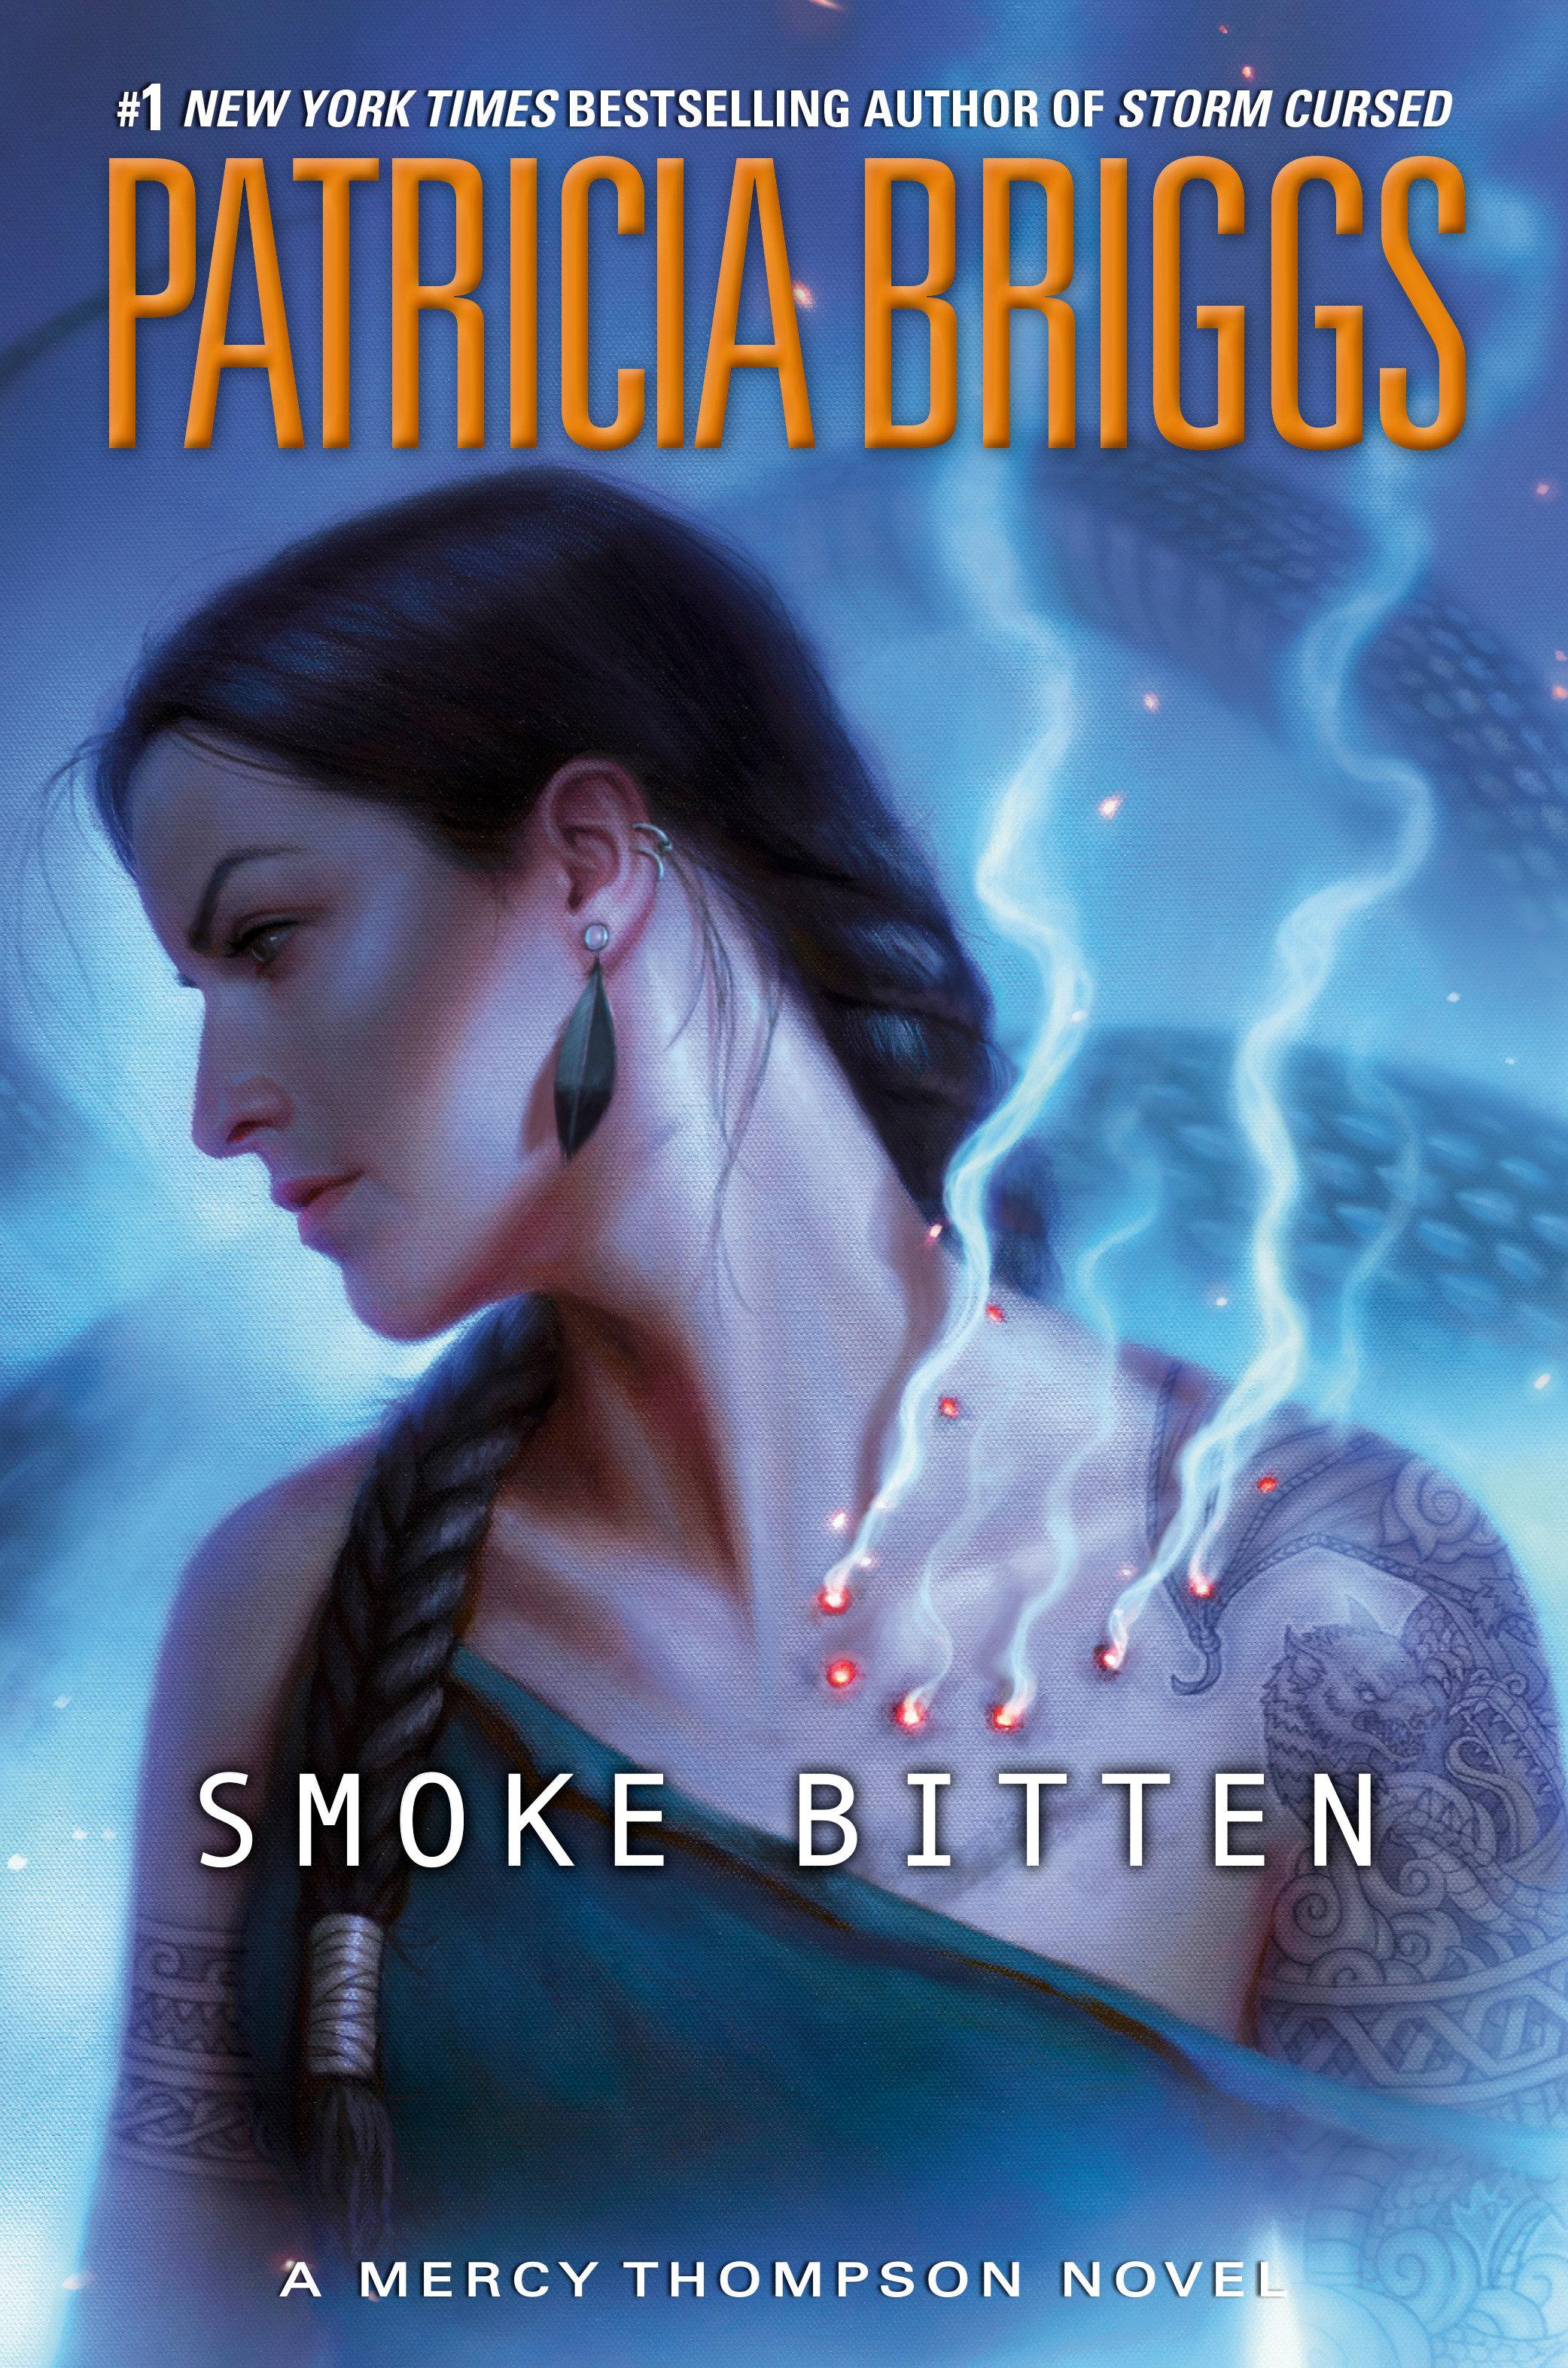 Smoke bitten cover image